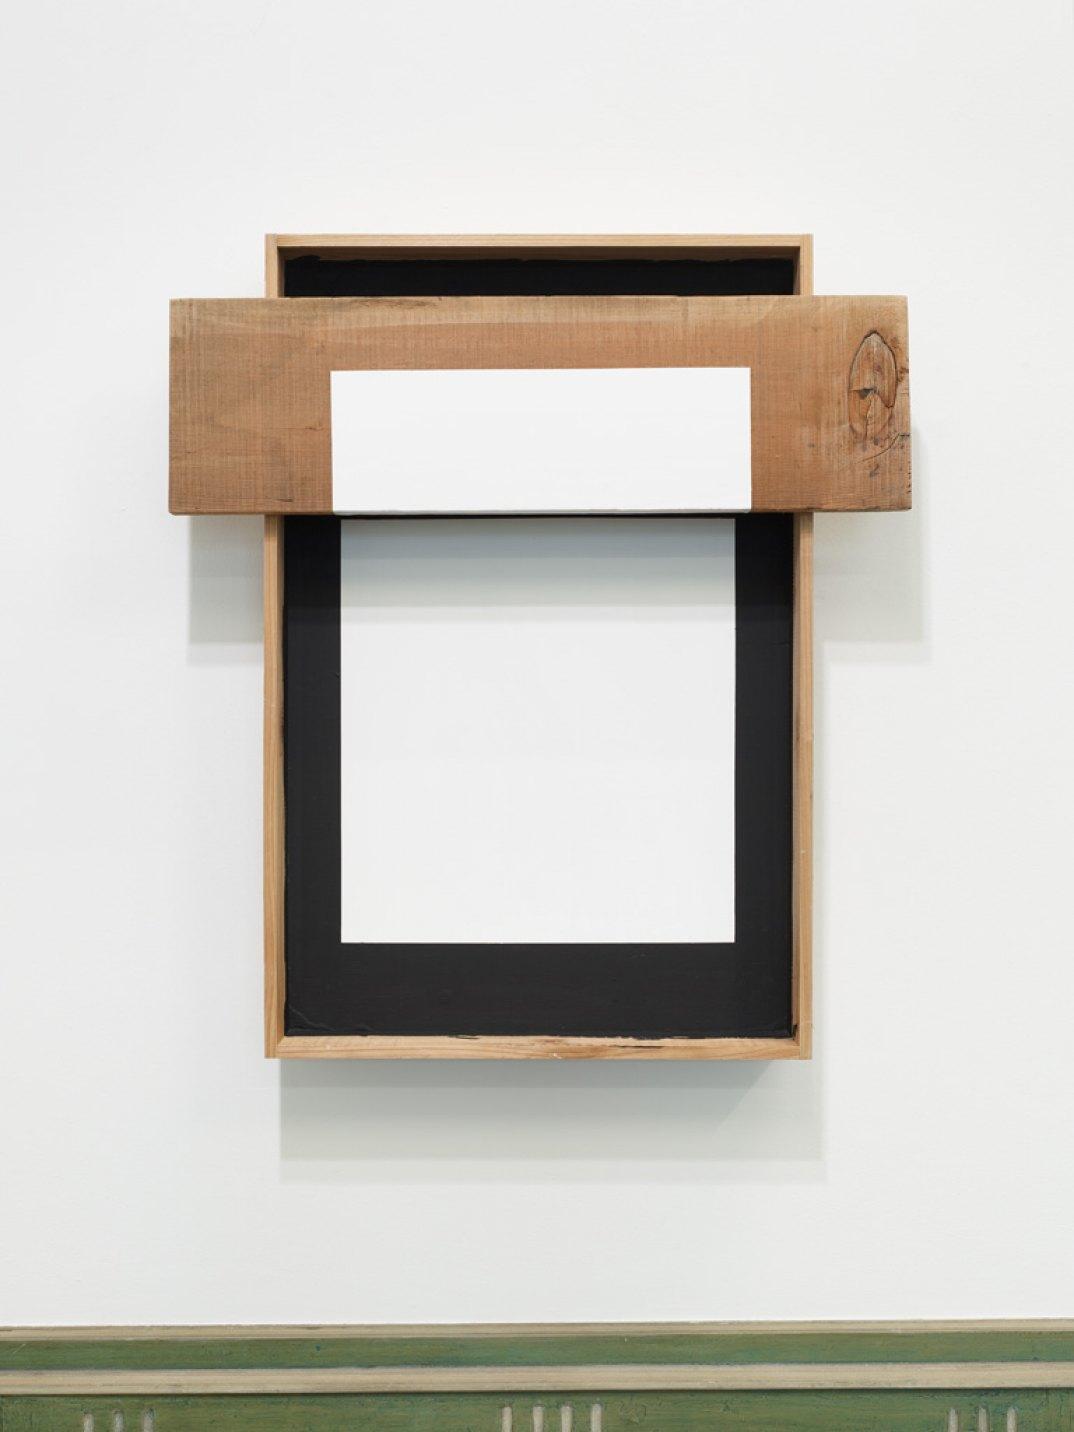 Kishio Suga, <em>Elapsing Spatialization</em>, 2017, wood, paint, 90 × 79,5 × 17 cm - Mendes Wood DM